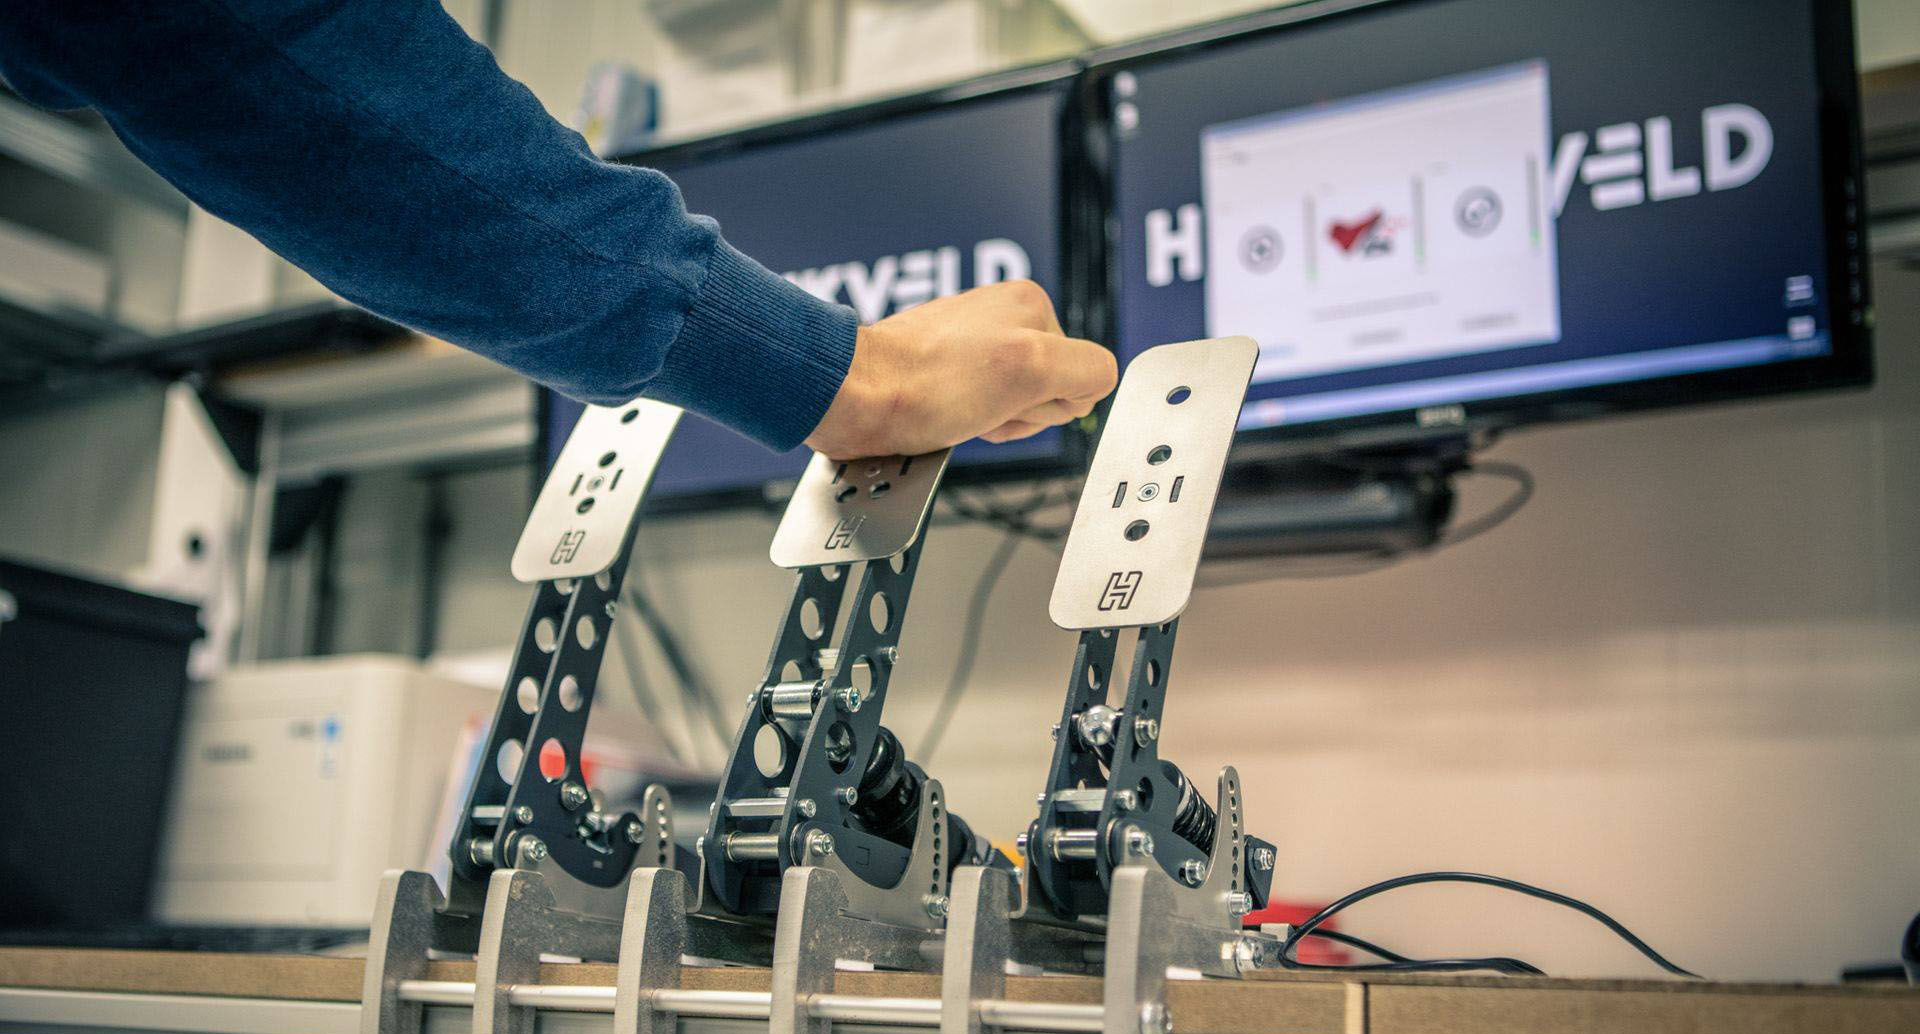 shop.gperformance.eu - Heusinkveld Sprint simracing eSports pedals - testing - G-Performance